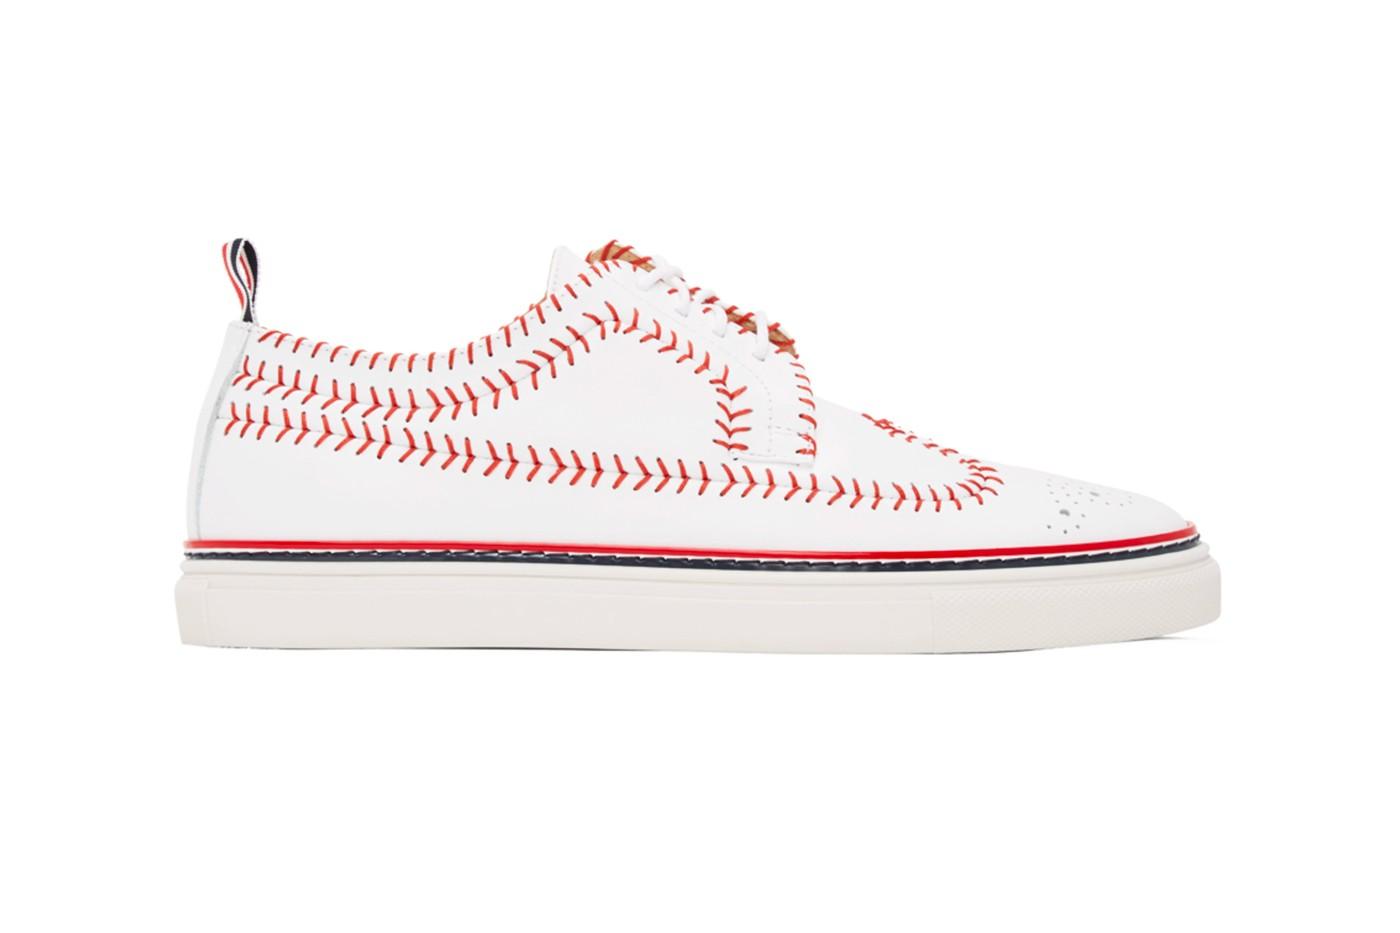 Thom Browne baseball sneakers side